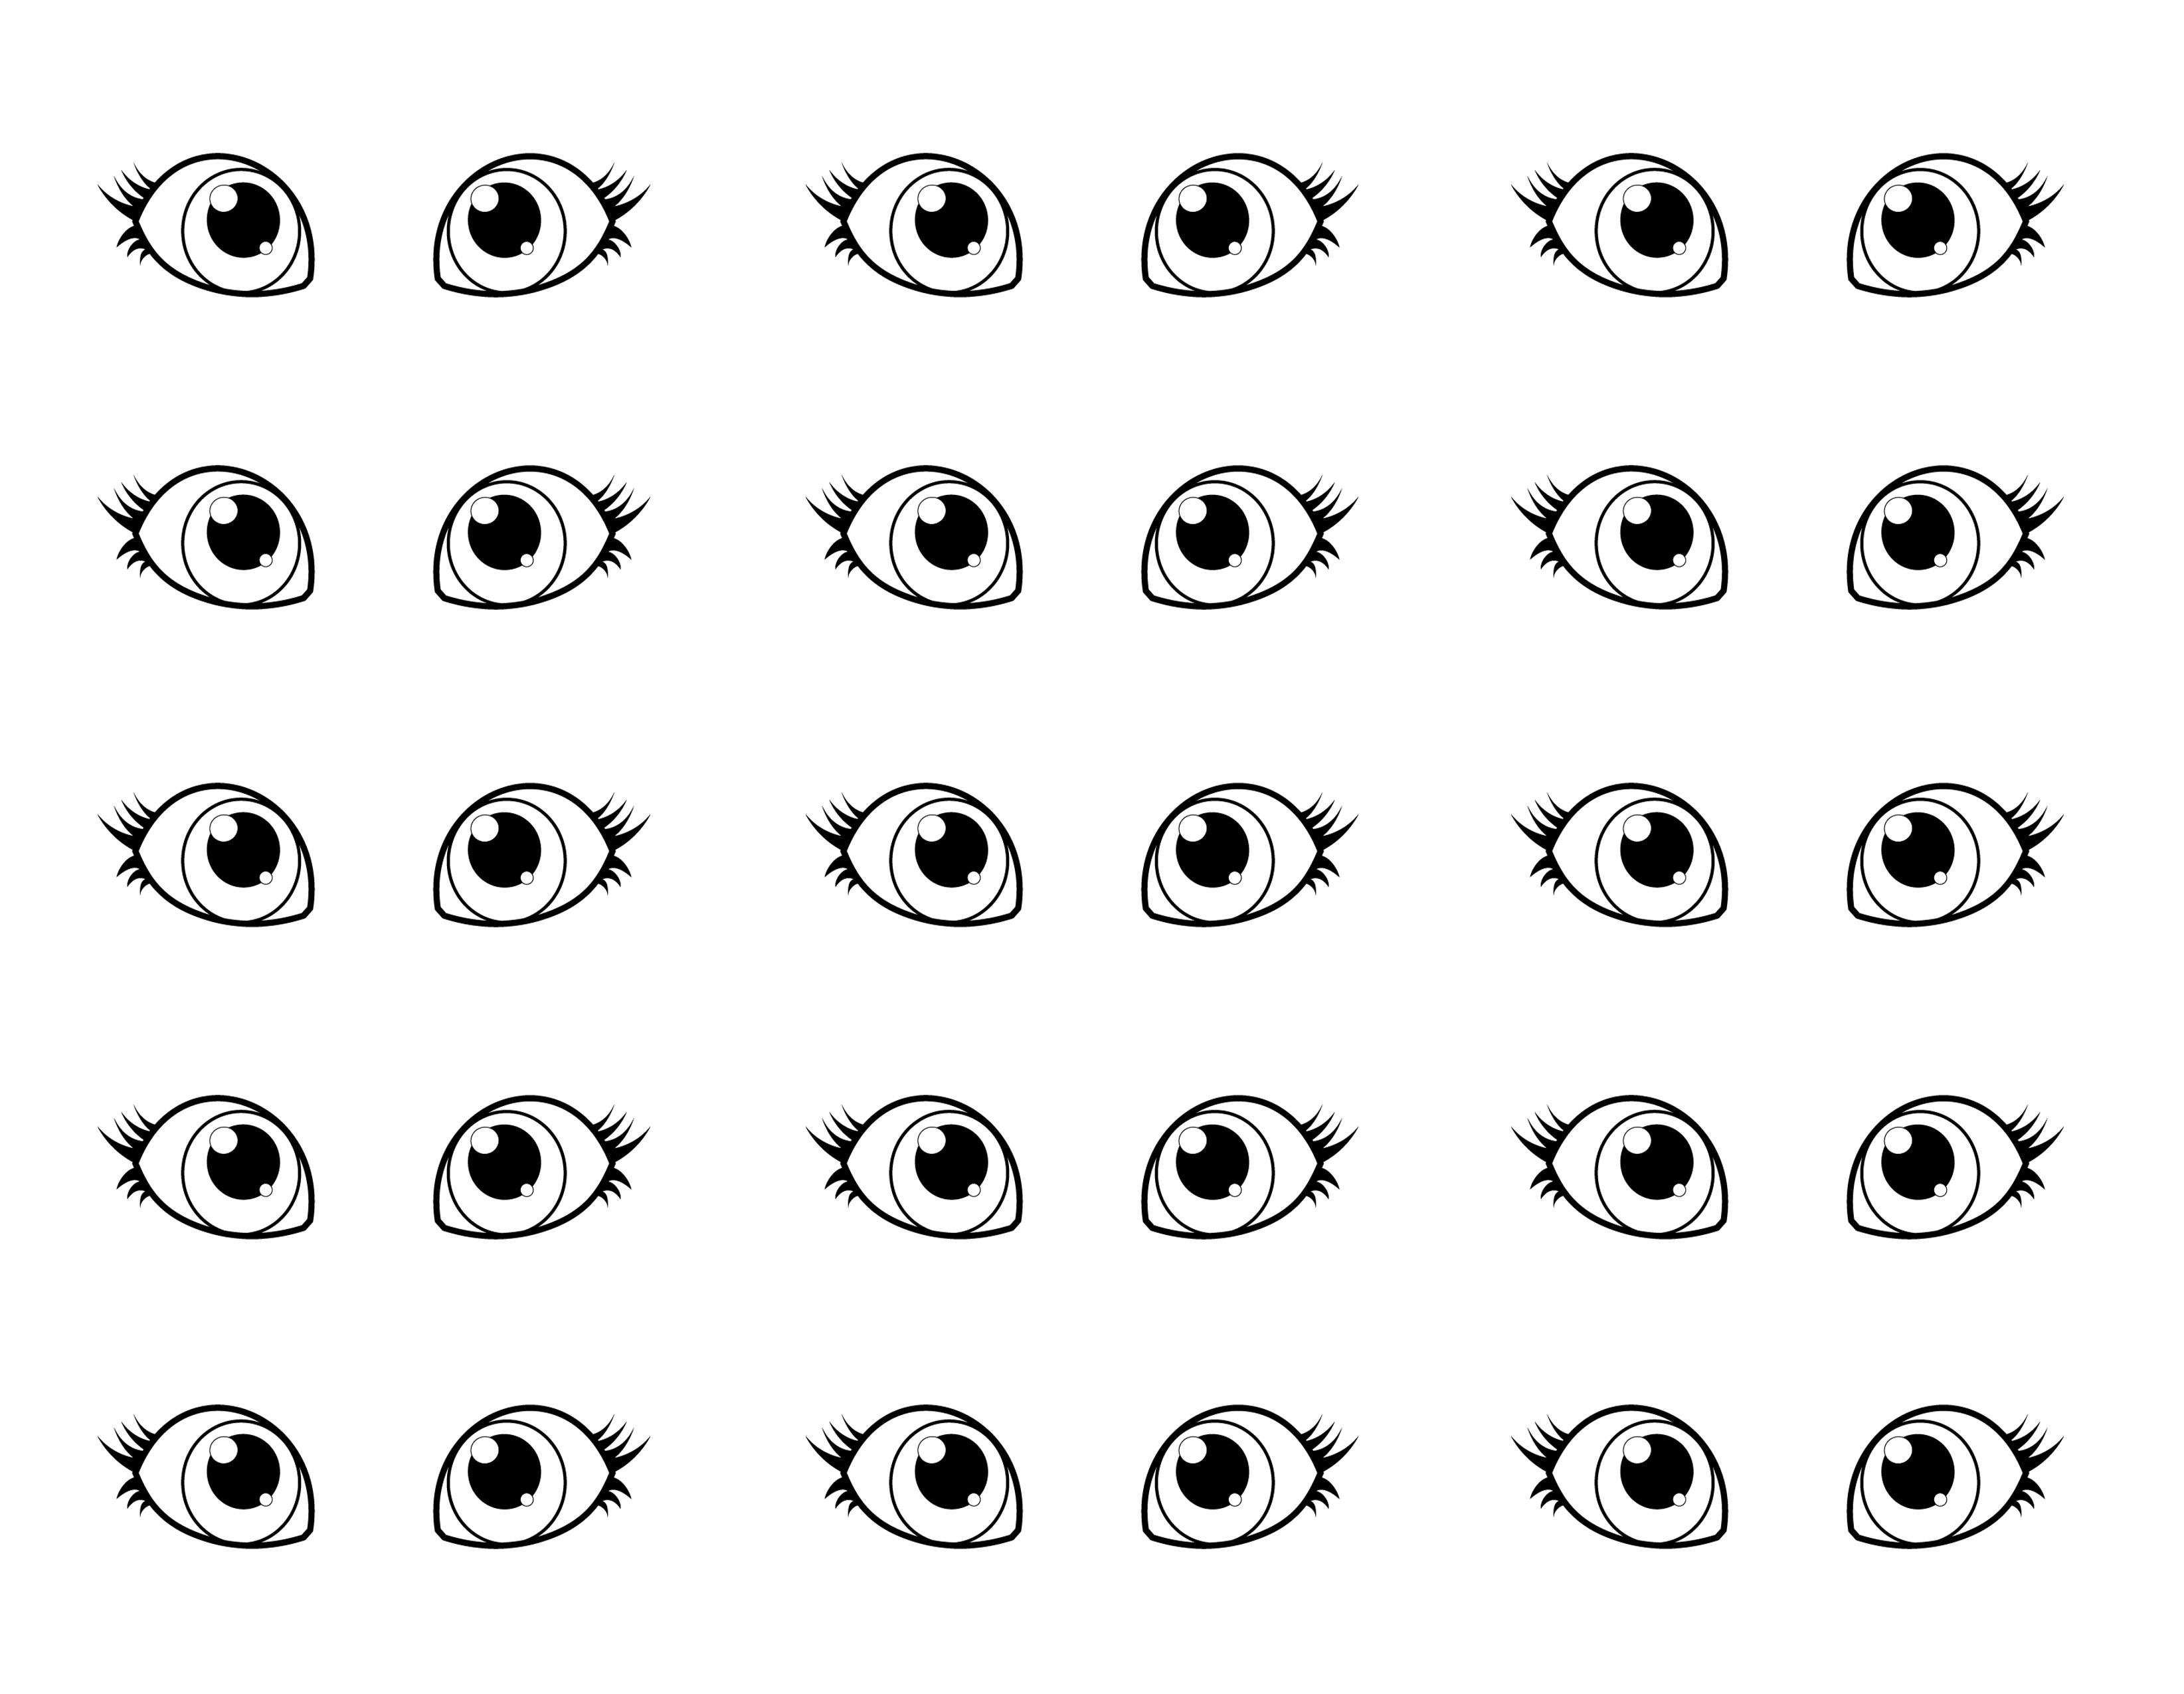 Drawn eyeball printable Eyeball 50 com Eyeball Ideas